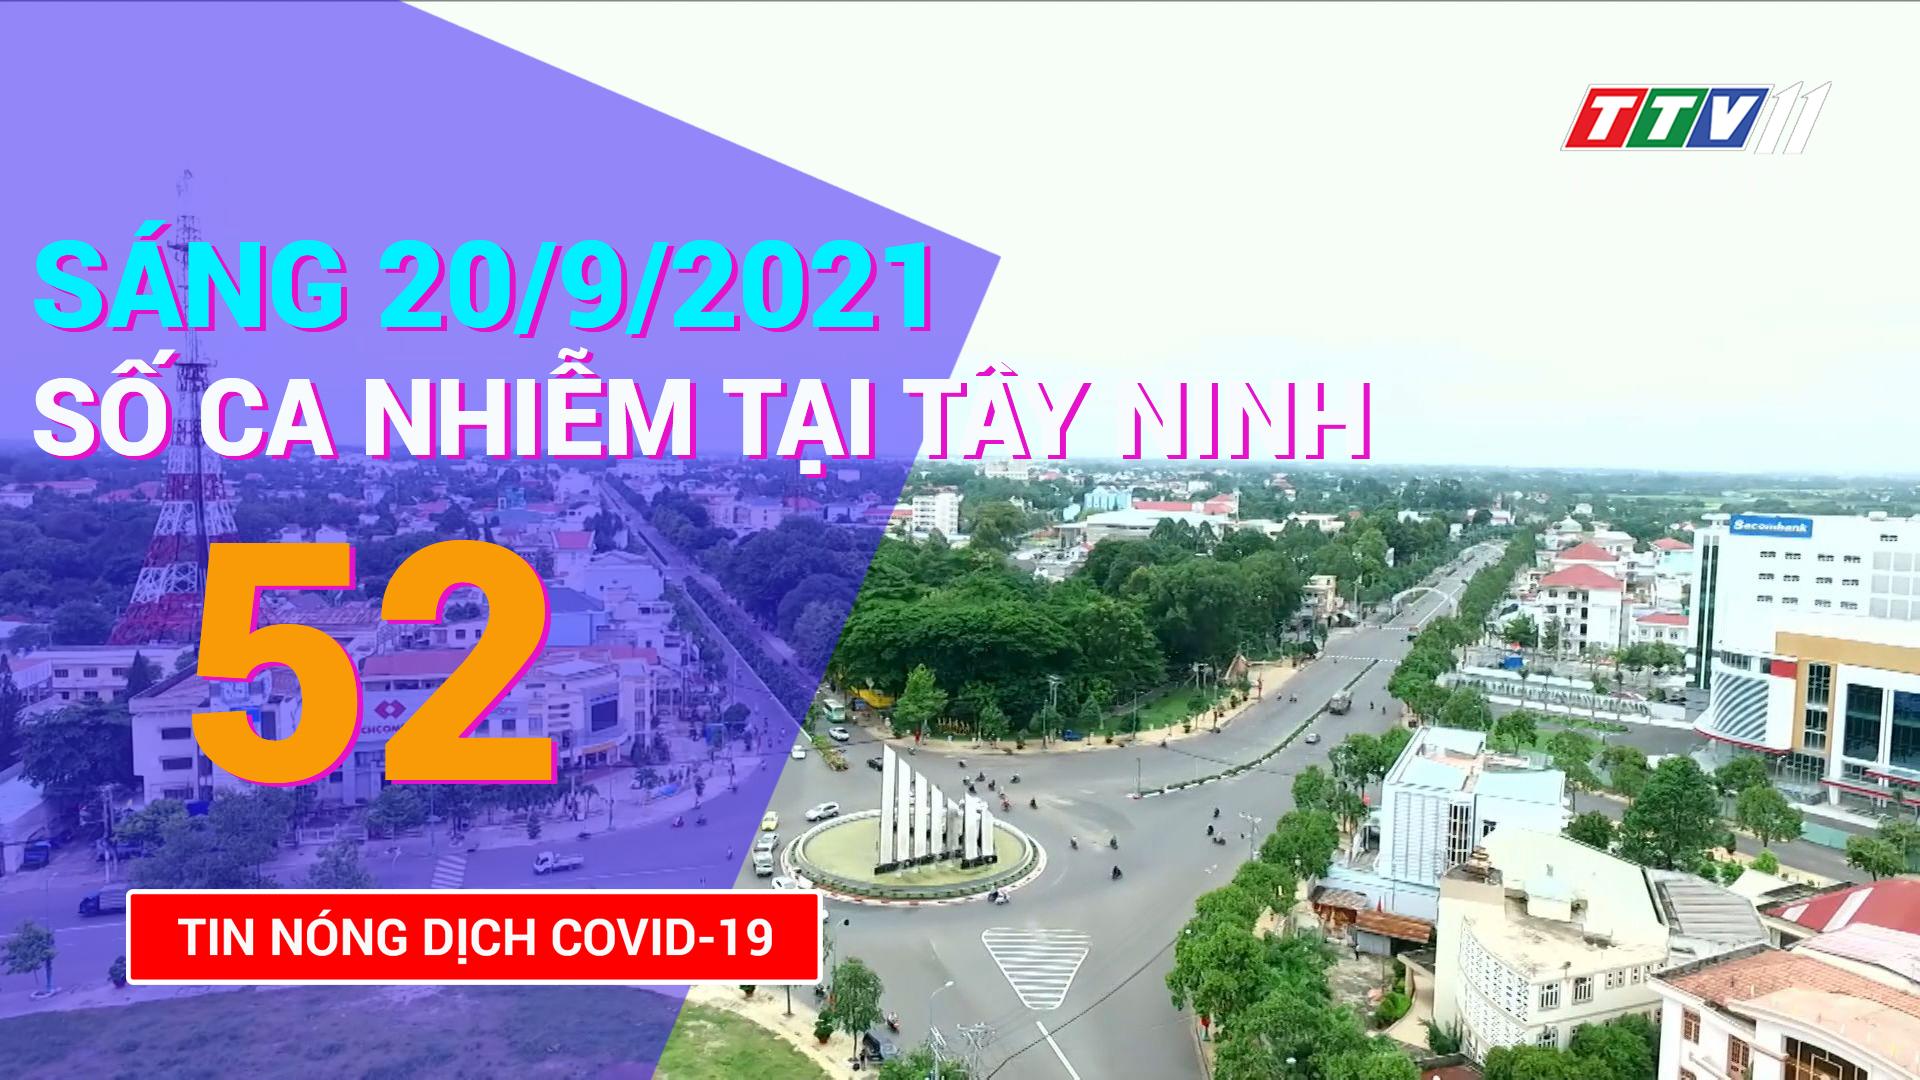 Tin tức Covid-19 tối 20/9/2021 | TayNinhTV